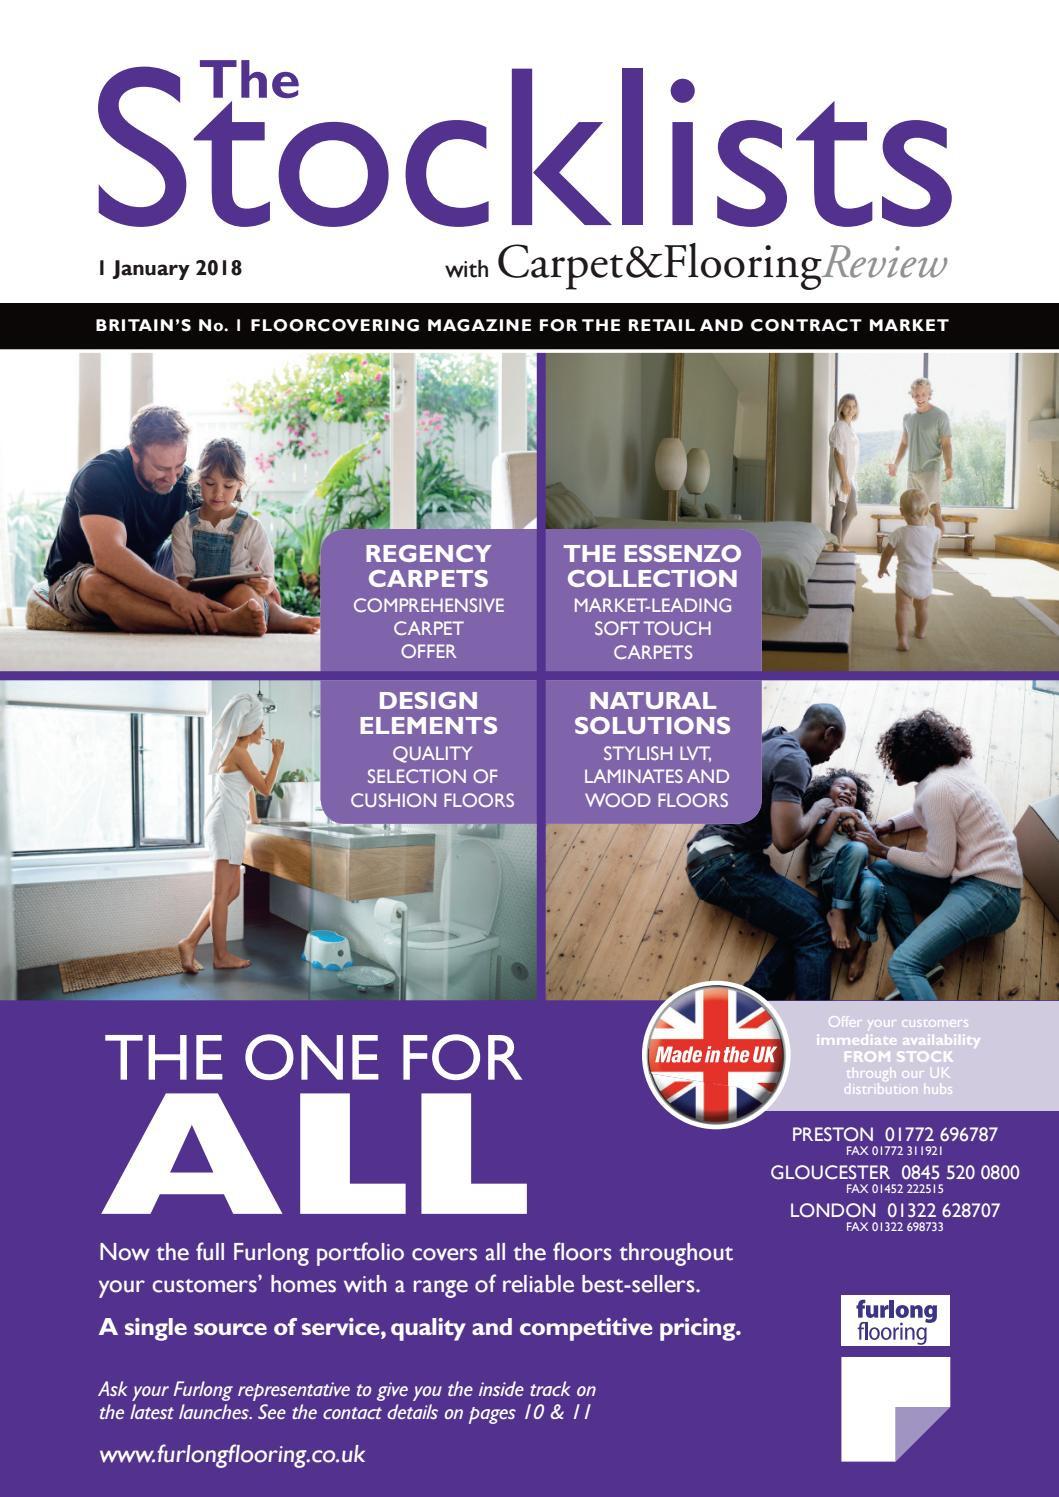 dm hardwood floors of the stocklists january 2018 by david spragg issuu inside page 1